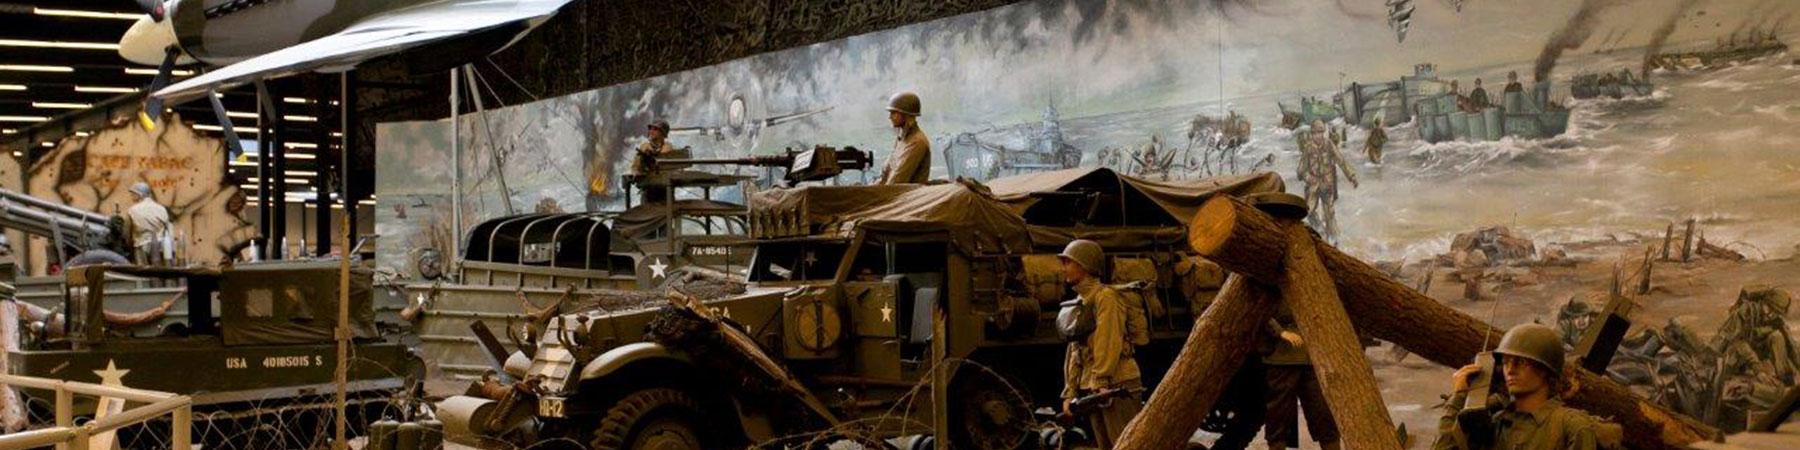 oorlogsmuseum-overloon3